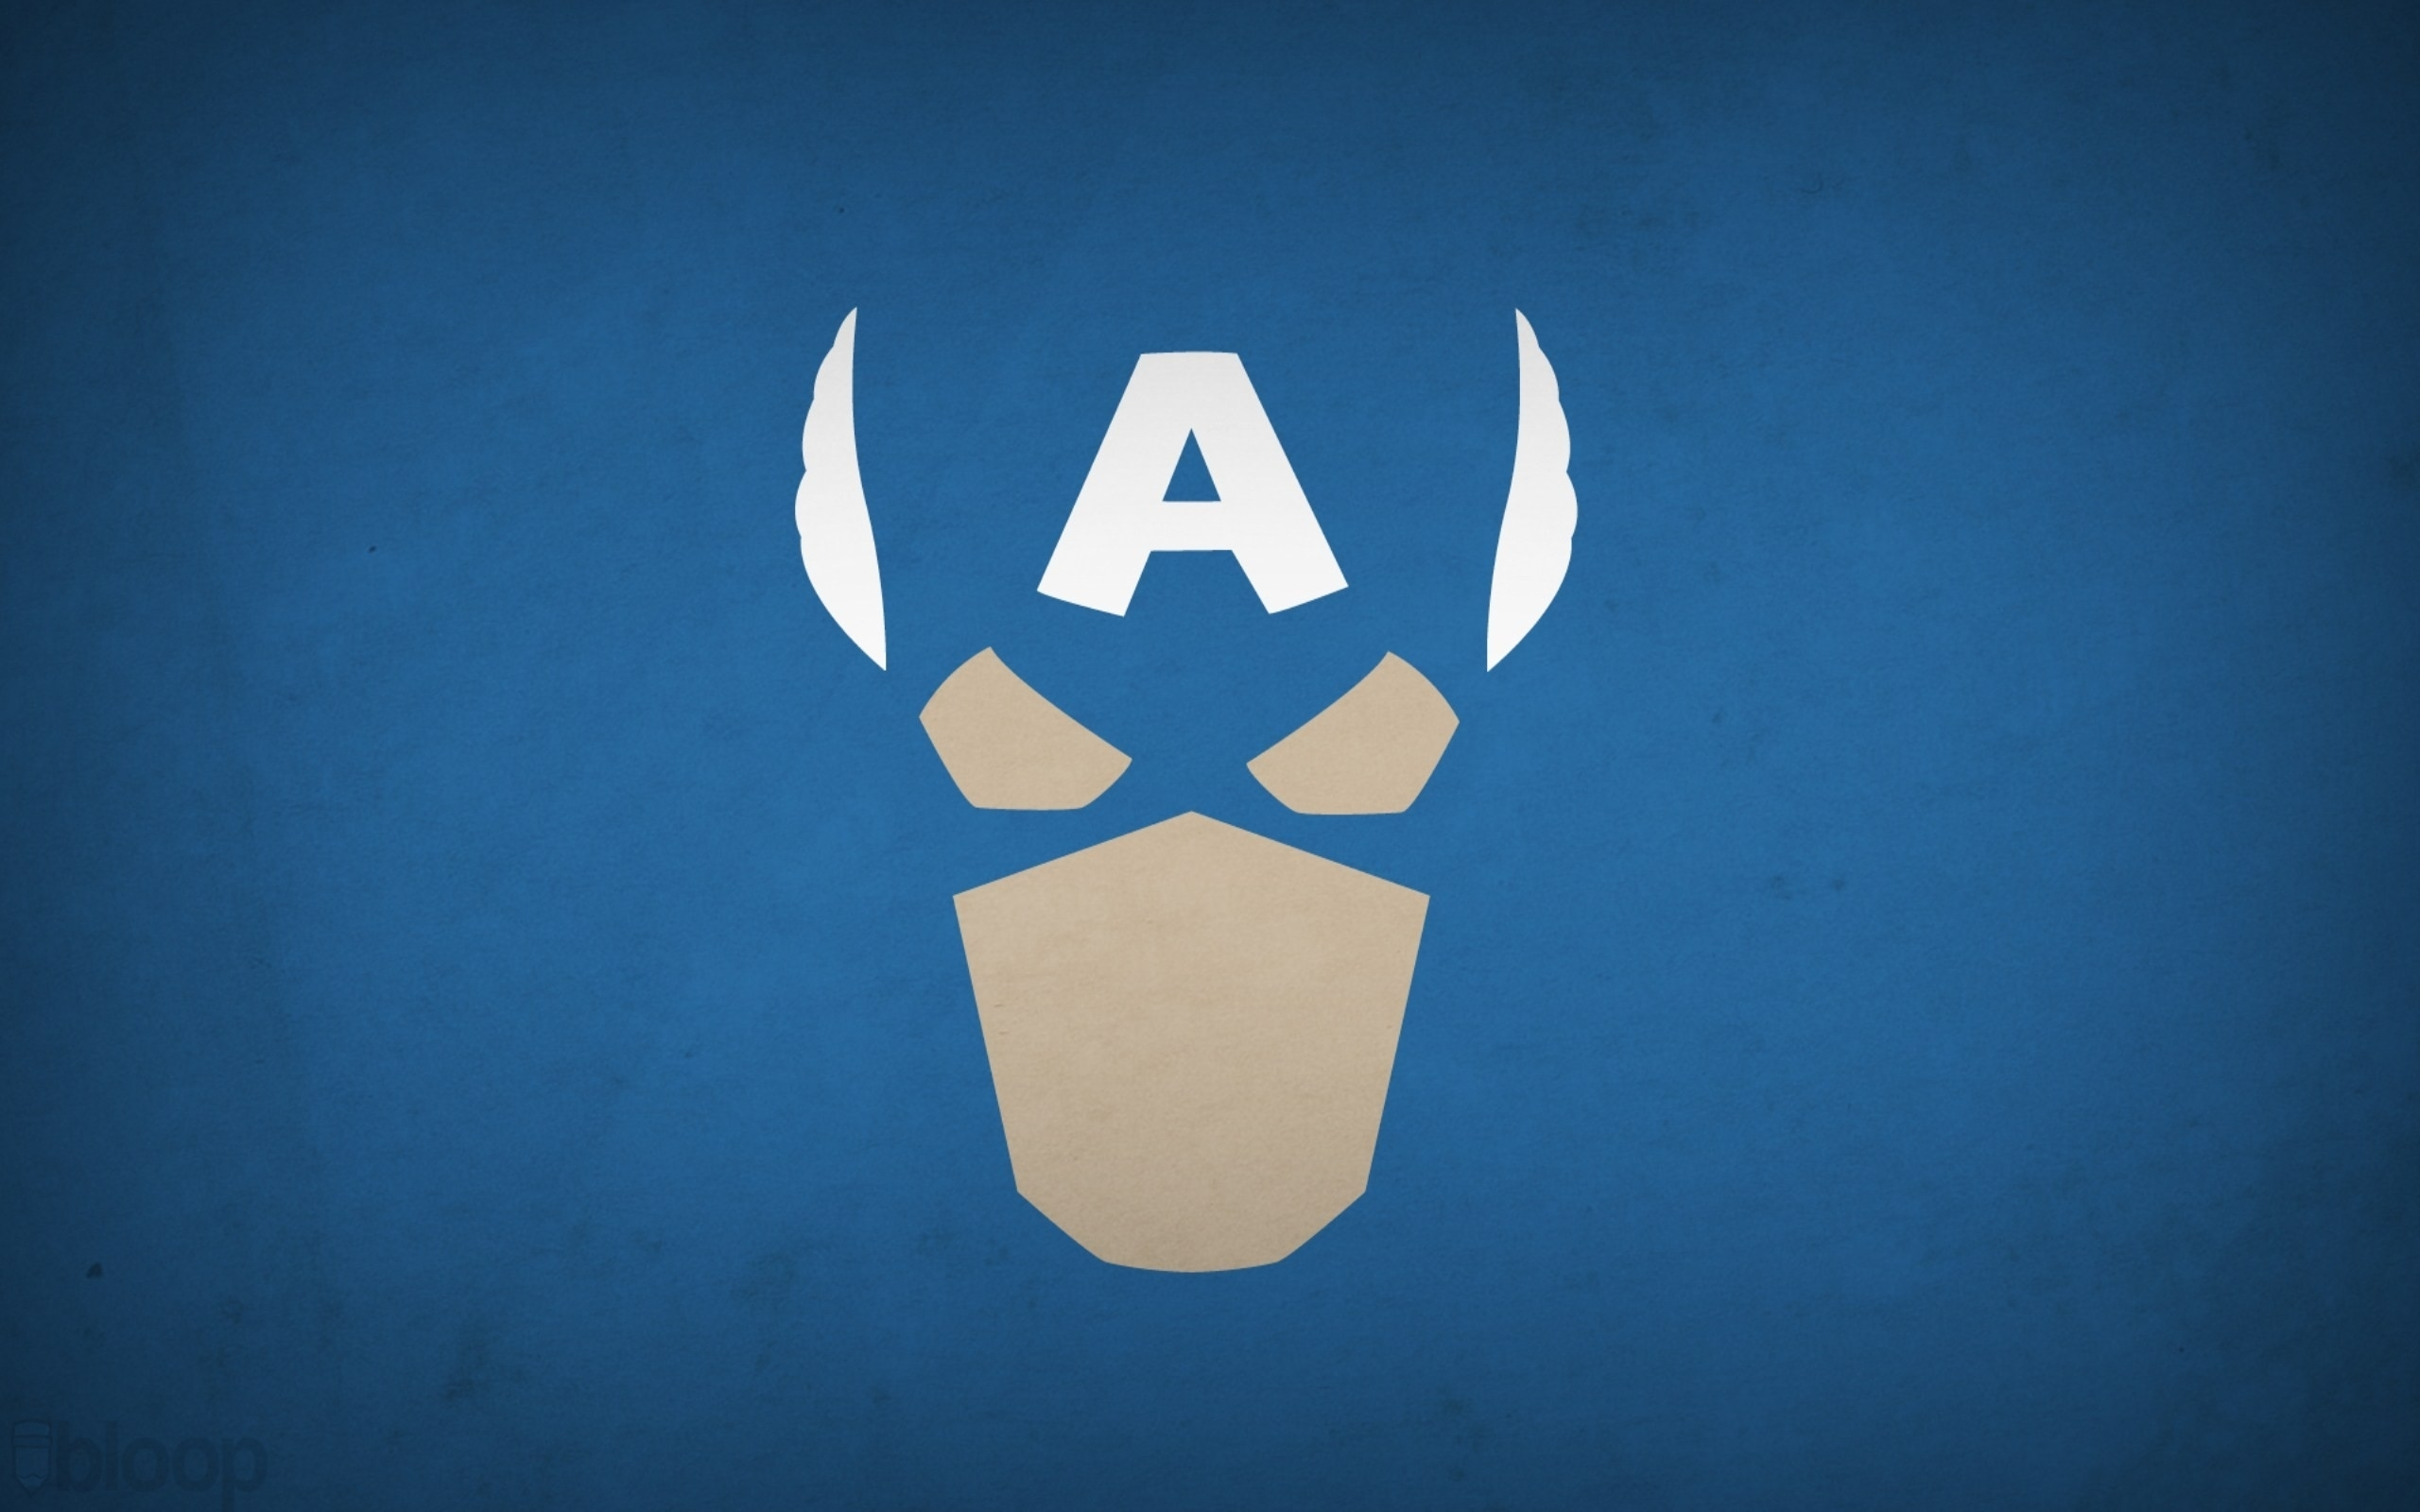 captain america superheroes marvel comics blue HD Wallpapers 2560x1600